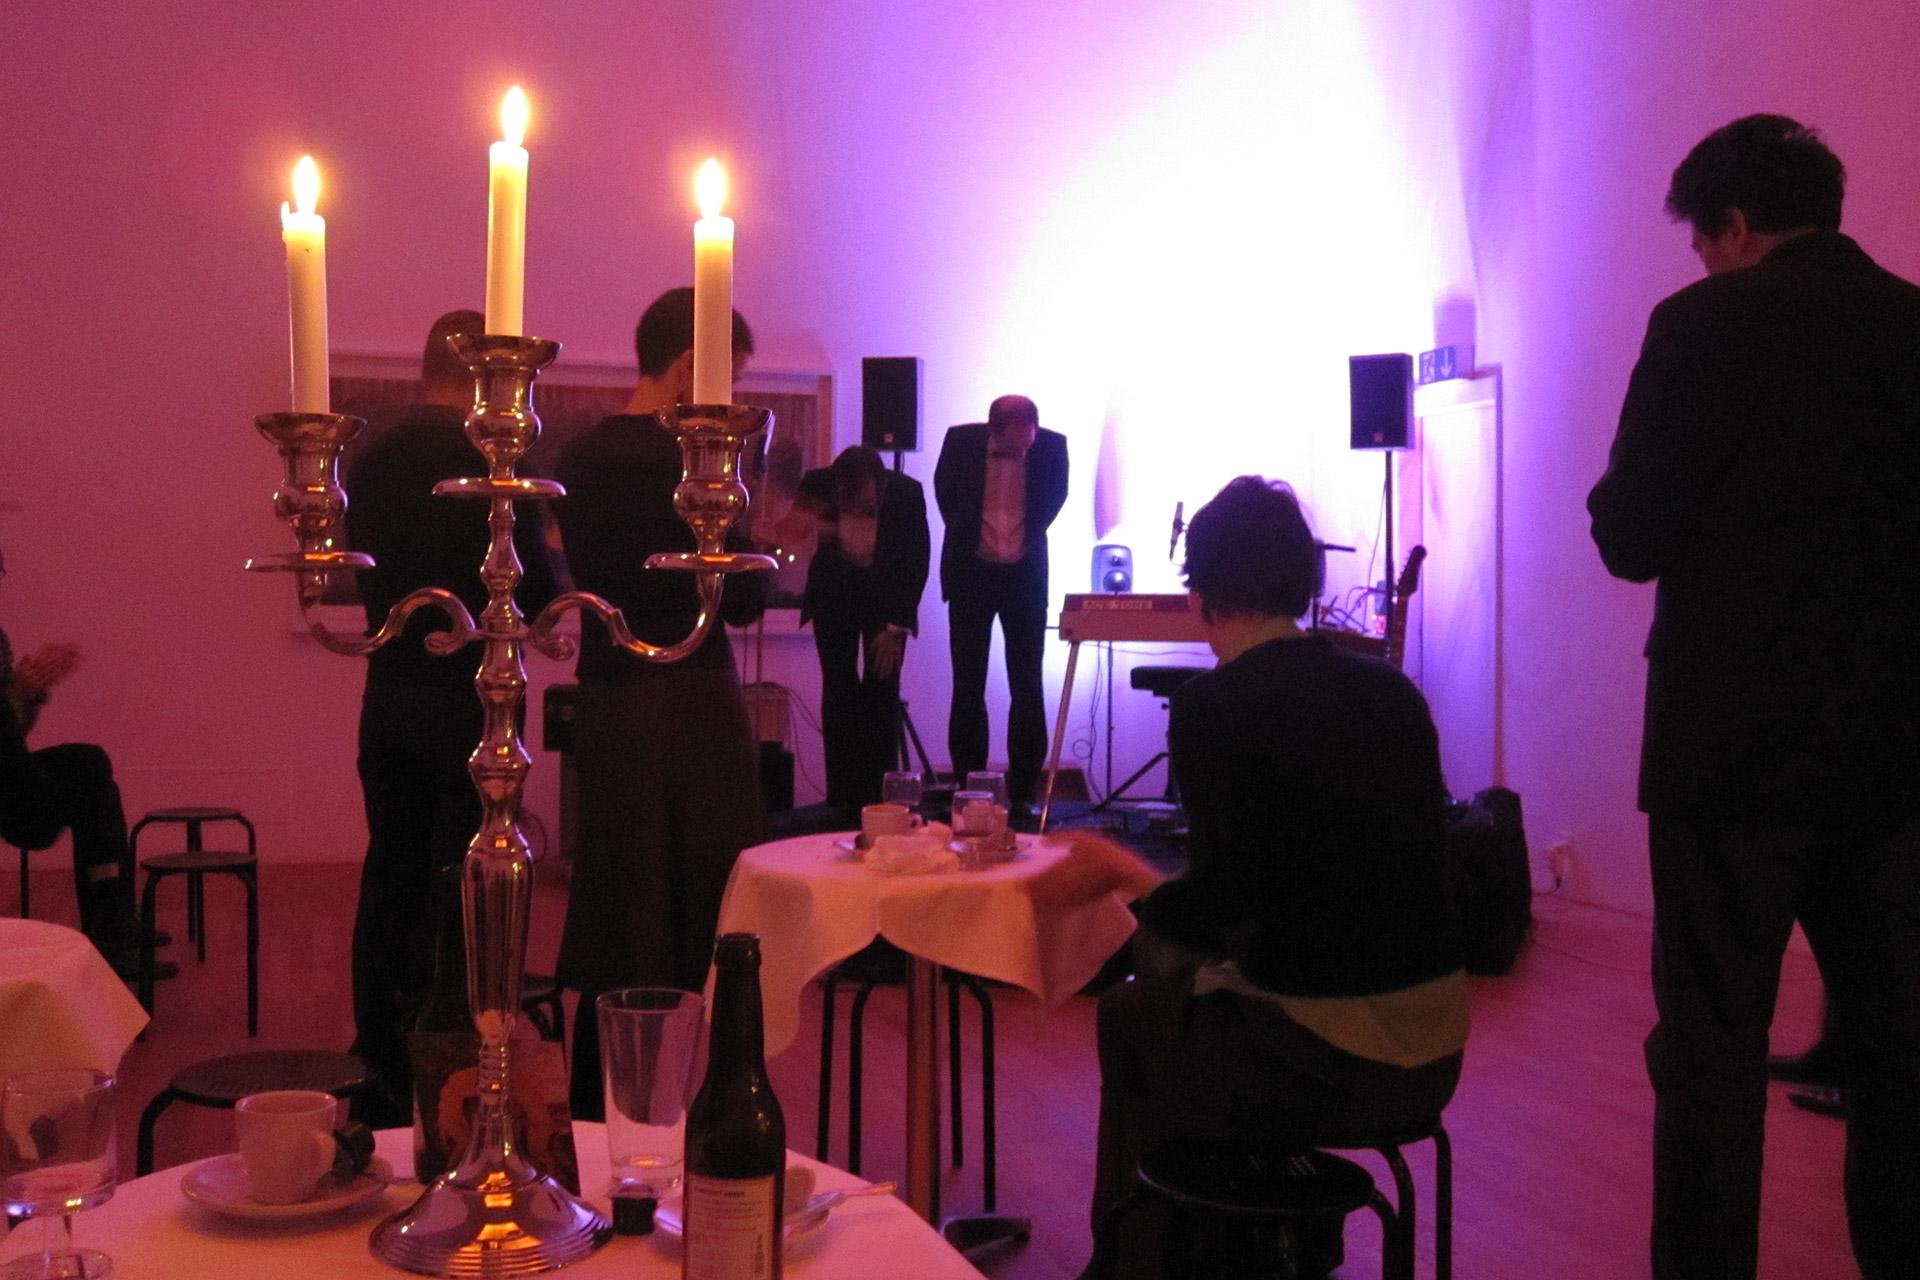 Dezember-Ausstellung-Kunsthalle-Winterthur-2010-1.jpg